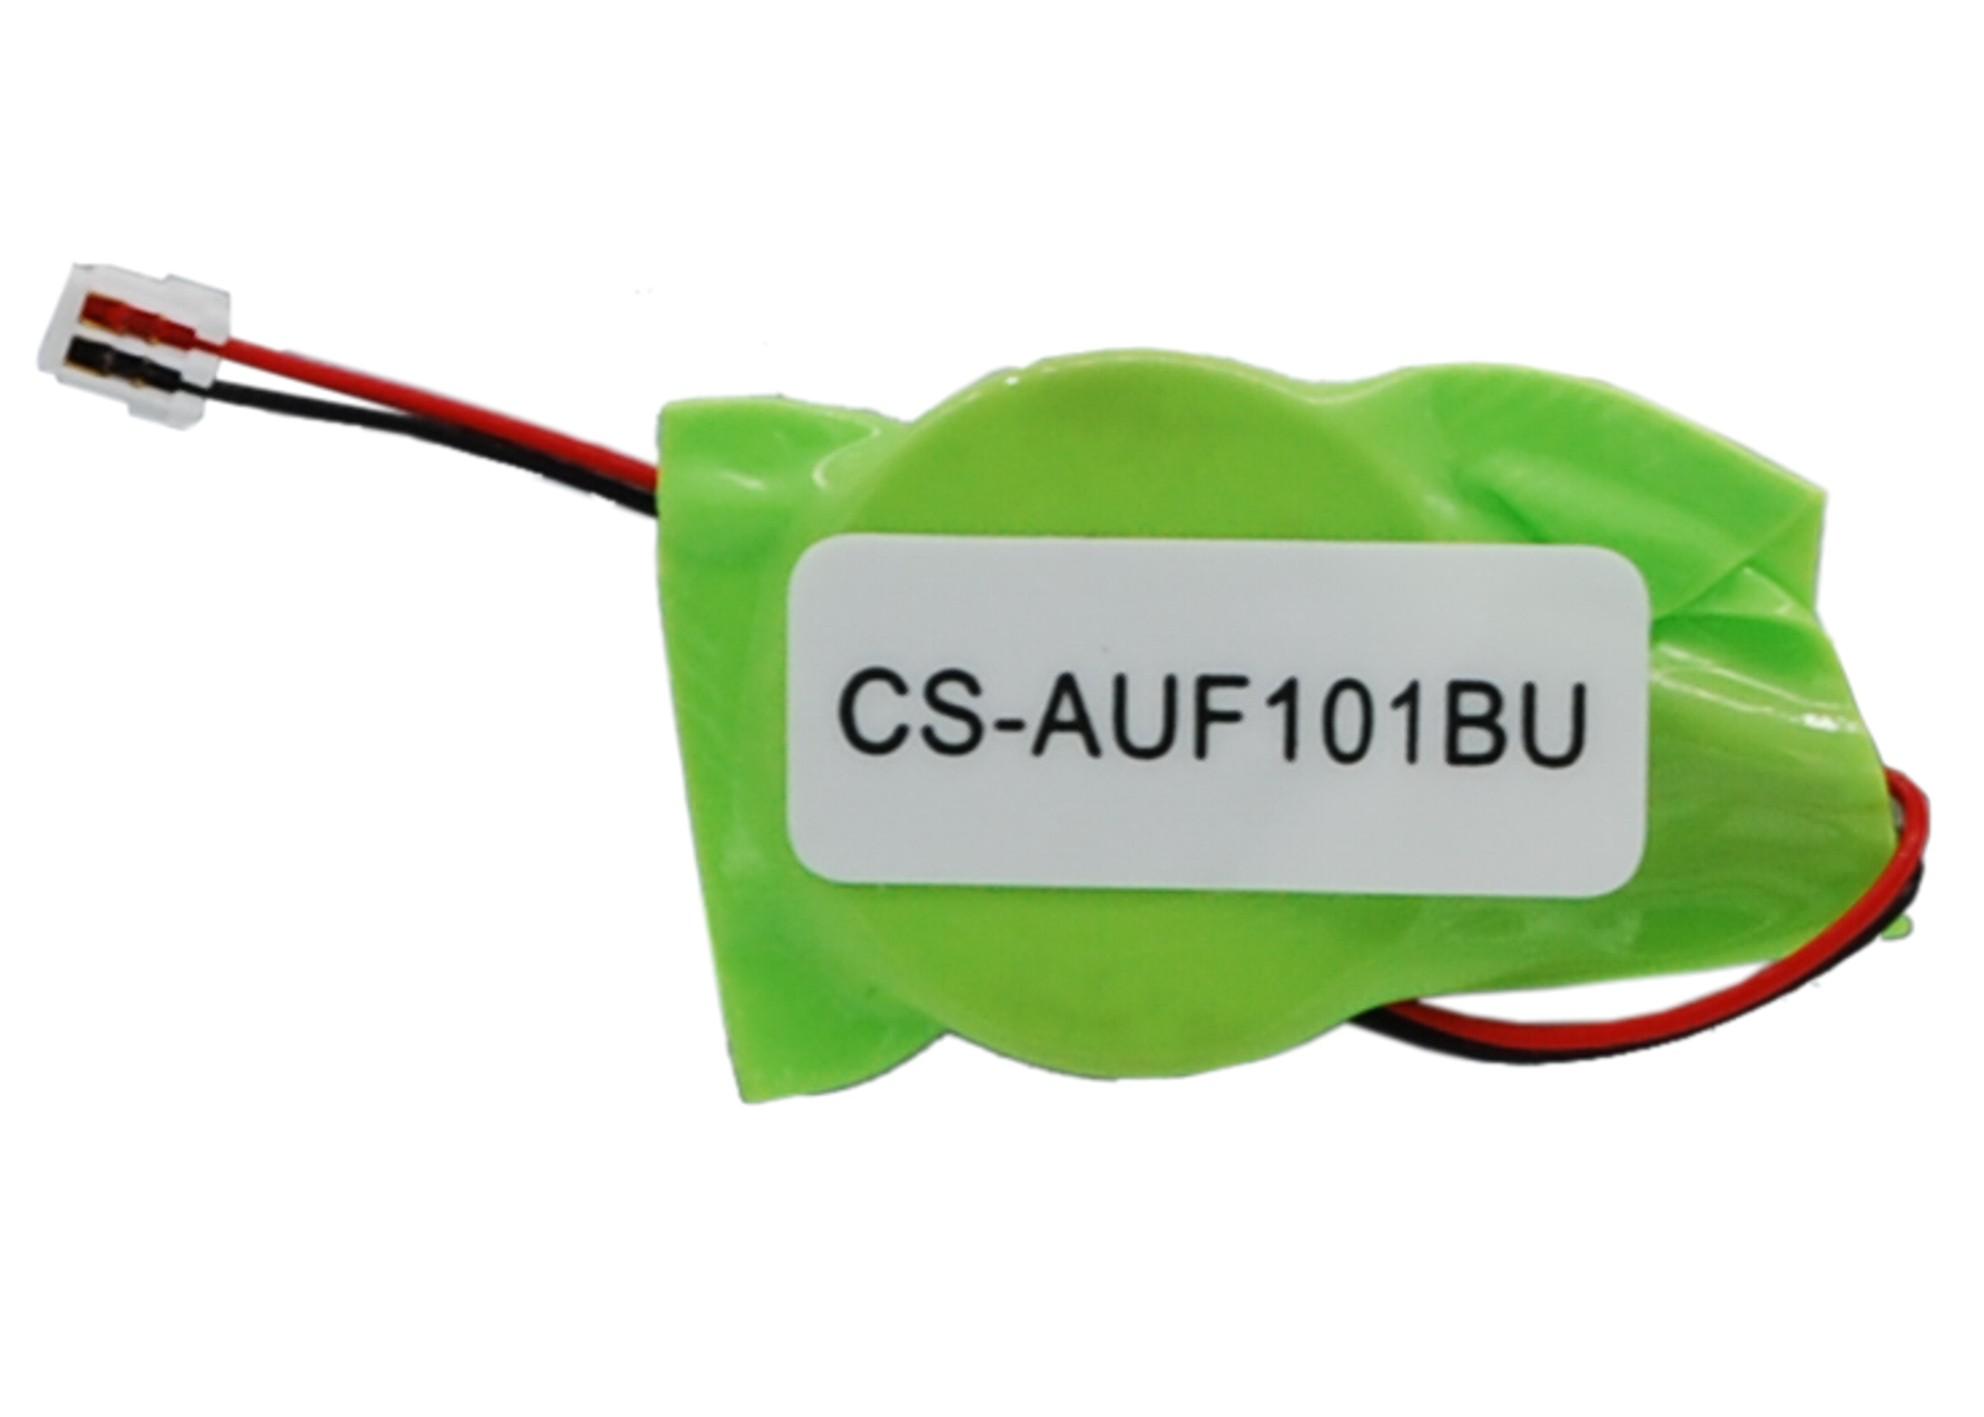 Cameron Sino baterie cmos pro ASUS Transformer Prime TF201-C1-GR 3V Li-ion 40mAh zelená - neoriginální